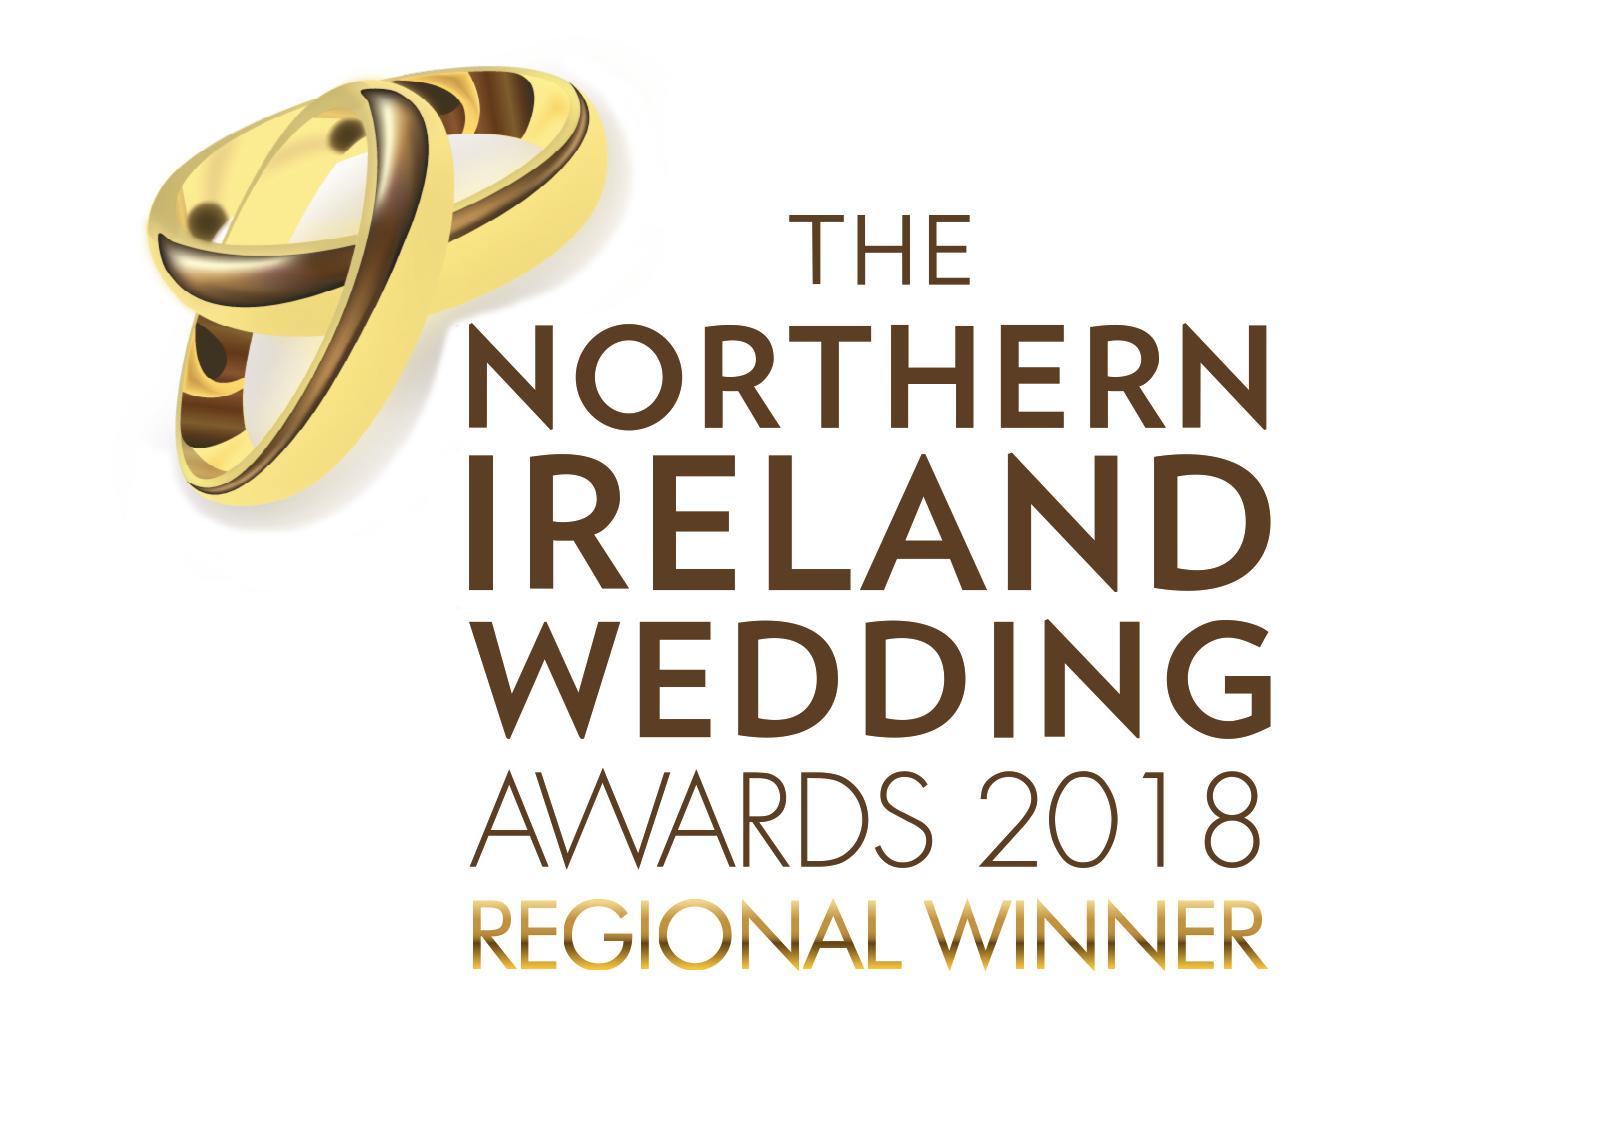 Regional Winner Logo.jpg